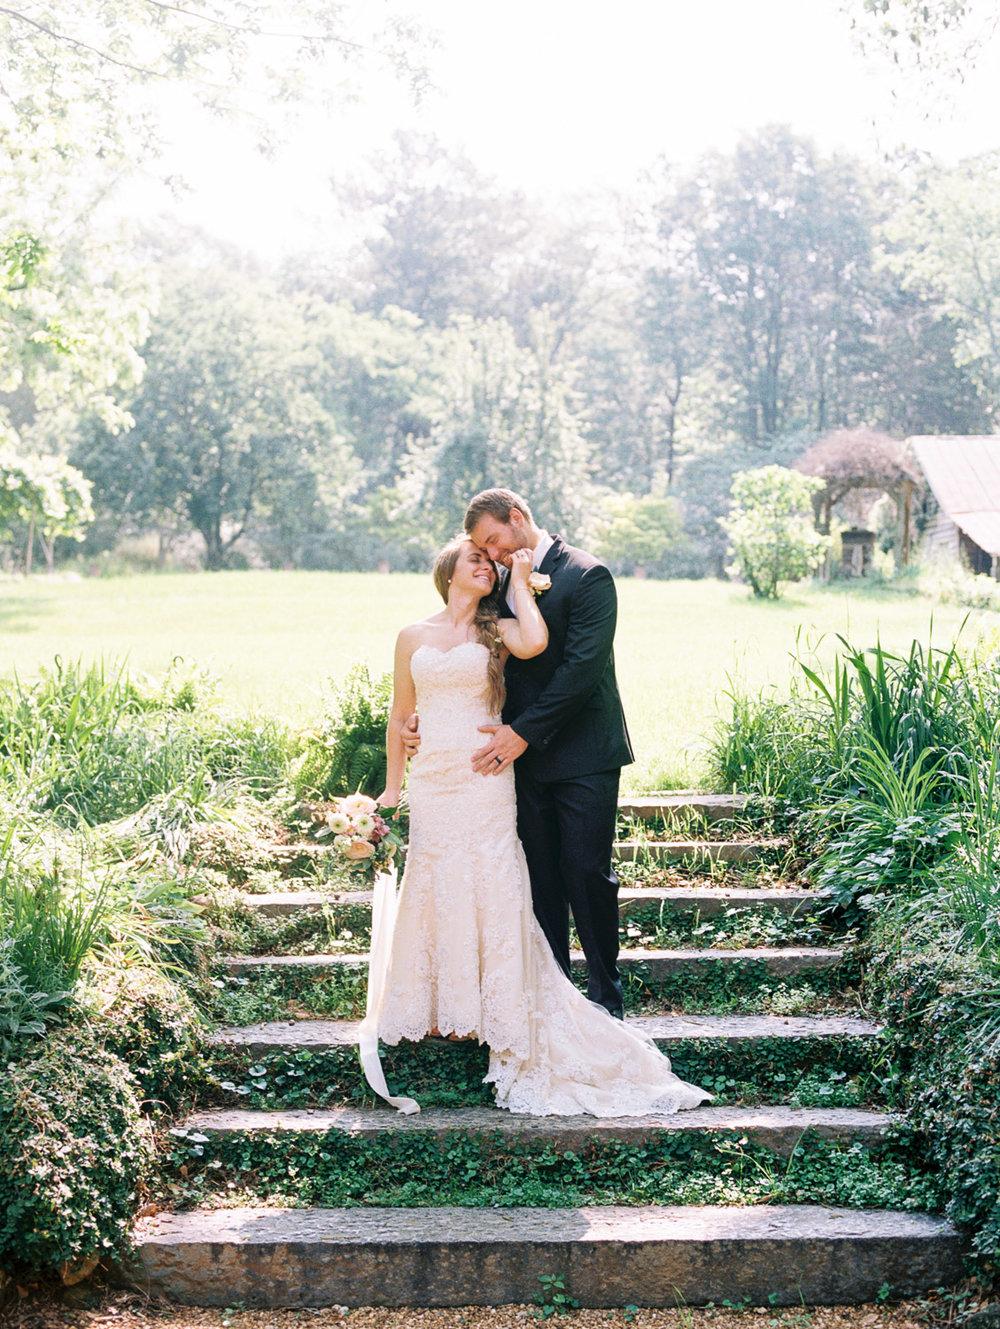 christinadavisphotography-romanticwedding-gardenweddinginspiration11.jpg